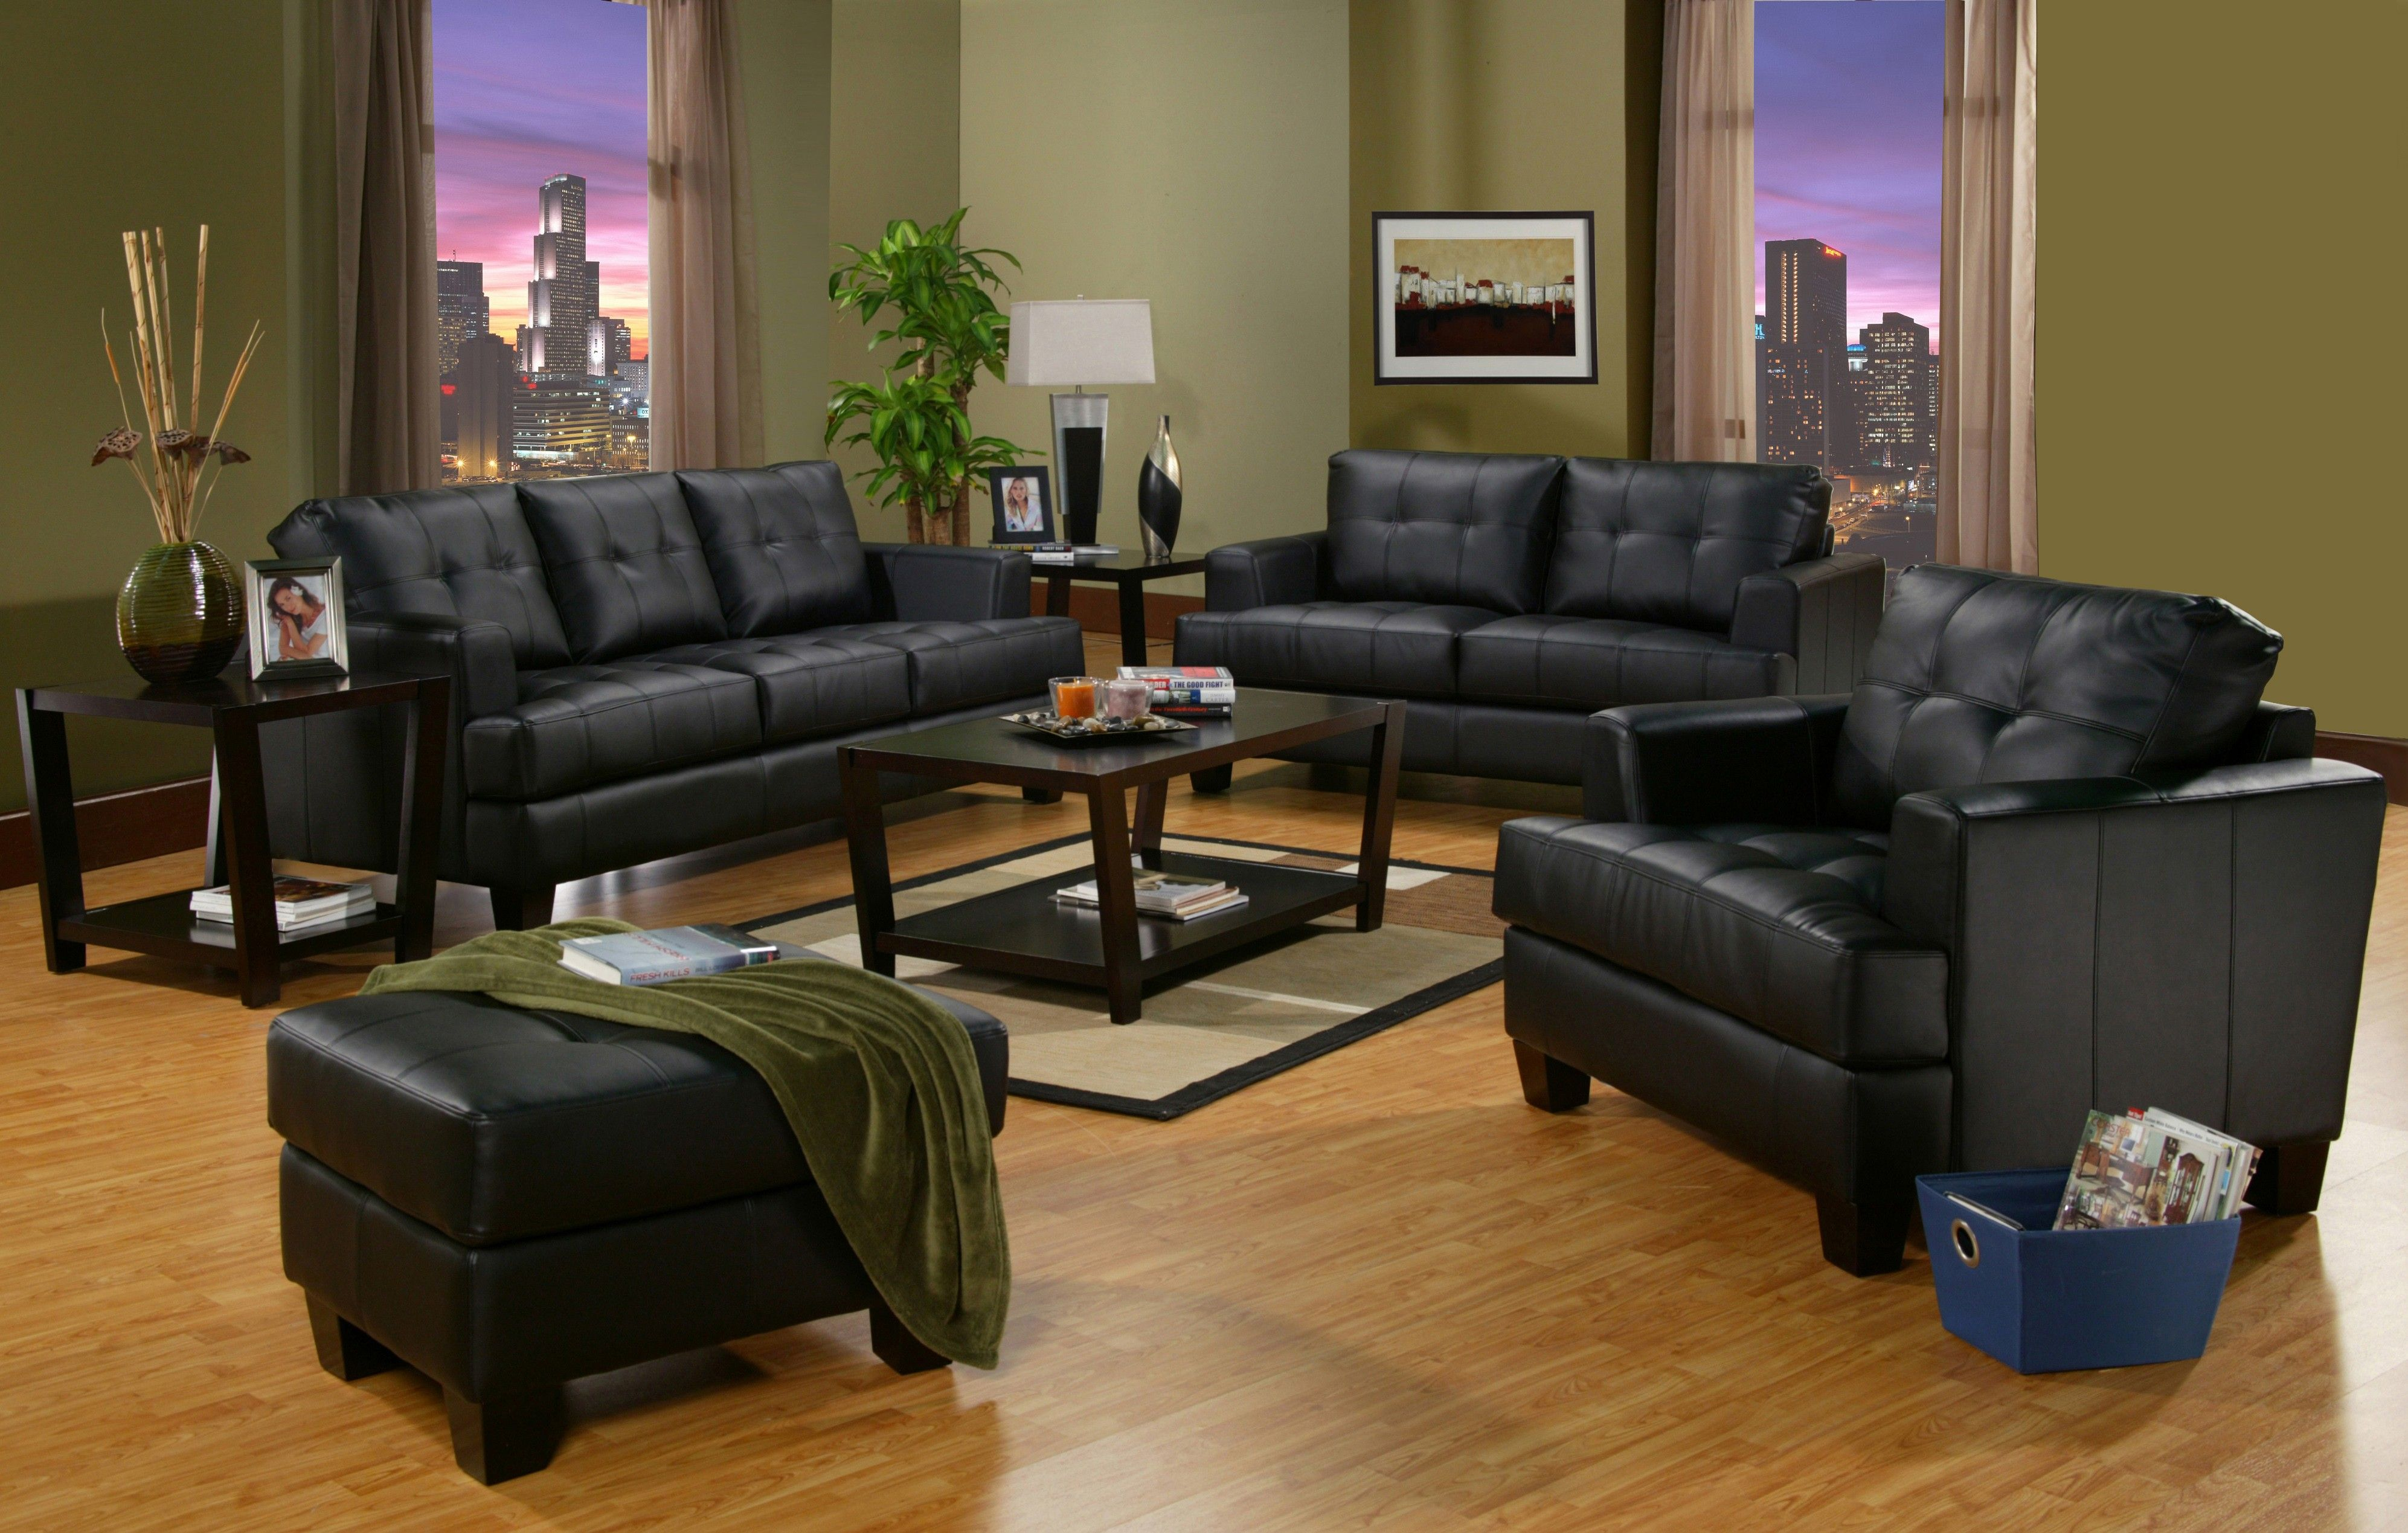 Good sofas Set grapy sofas amazing gray reclining sofa dark